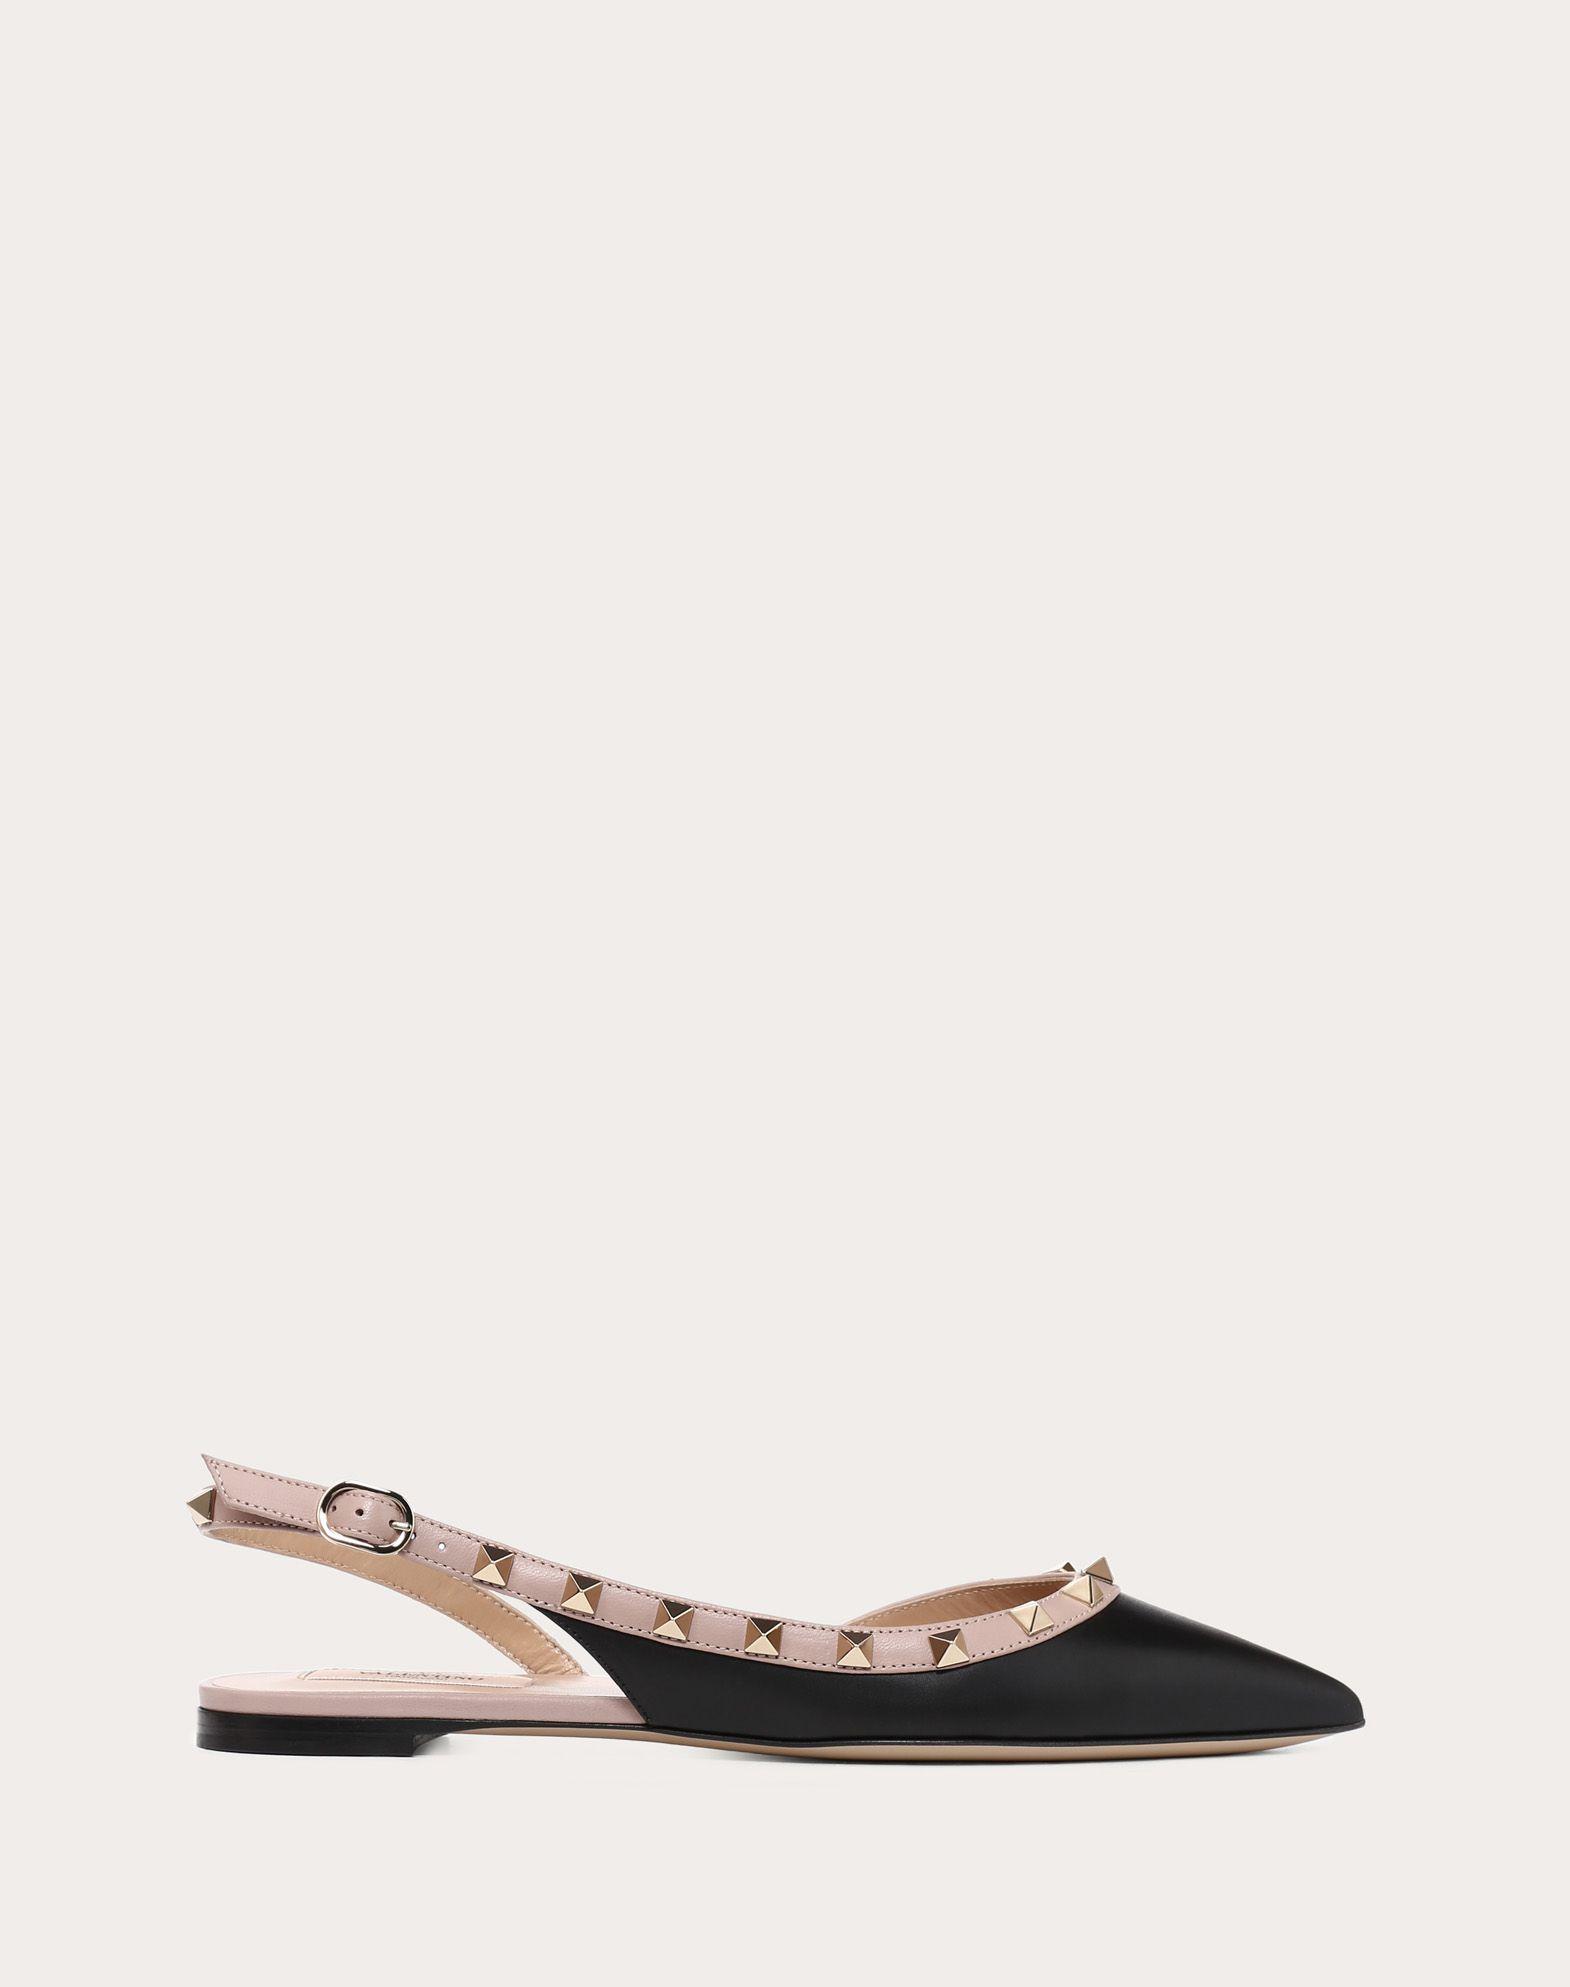 VALENTINO Studs Narrow toeline Leather sole Buckle  11470572hf